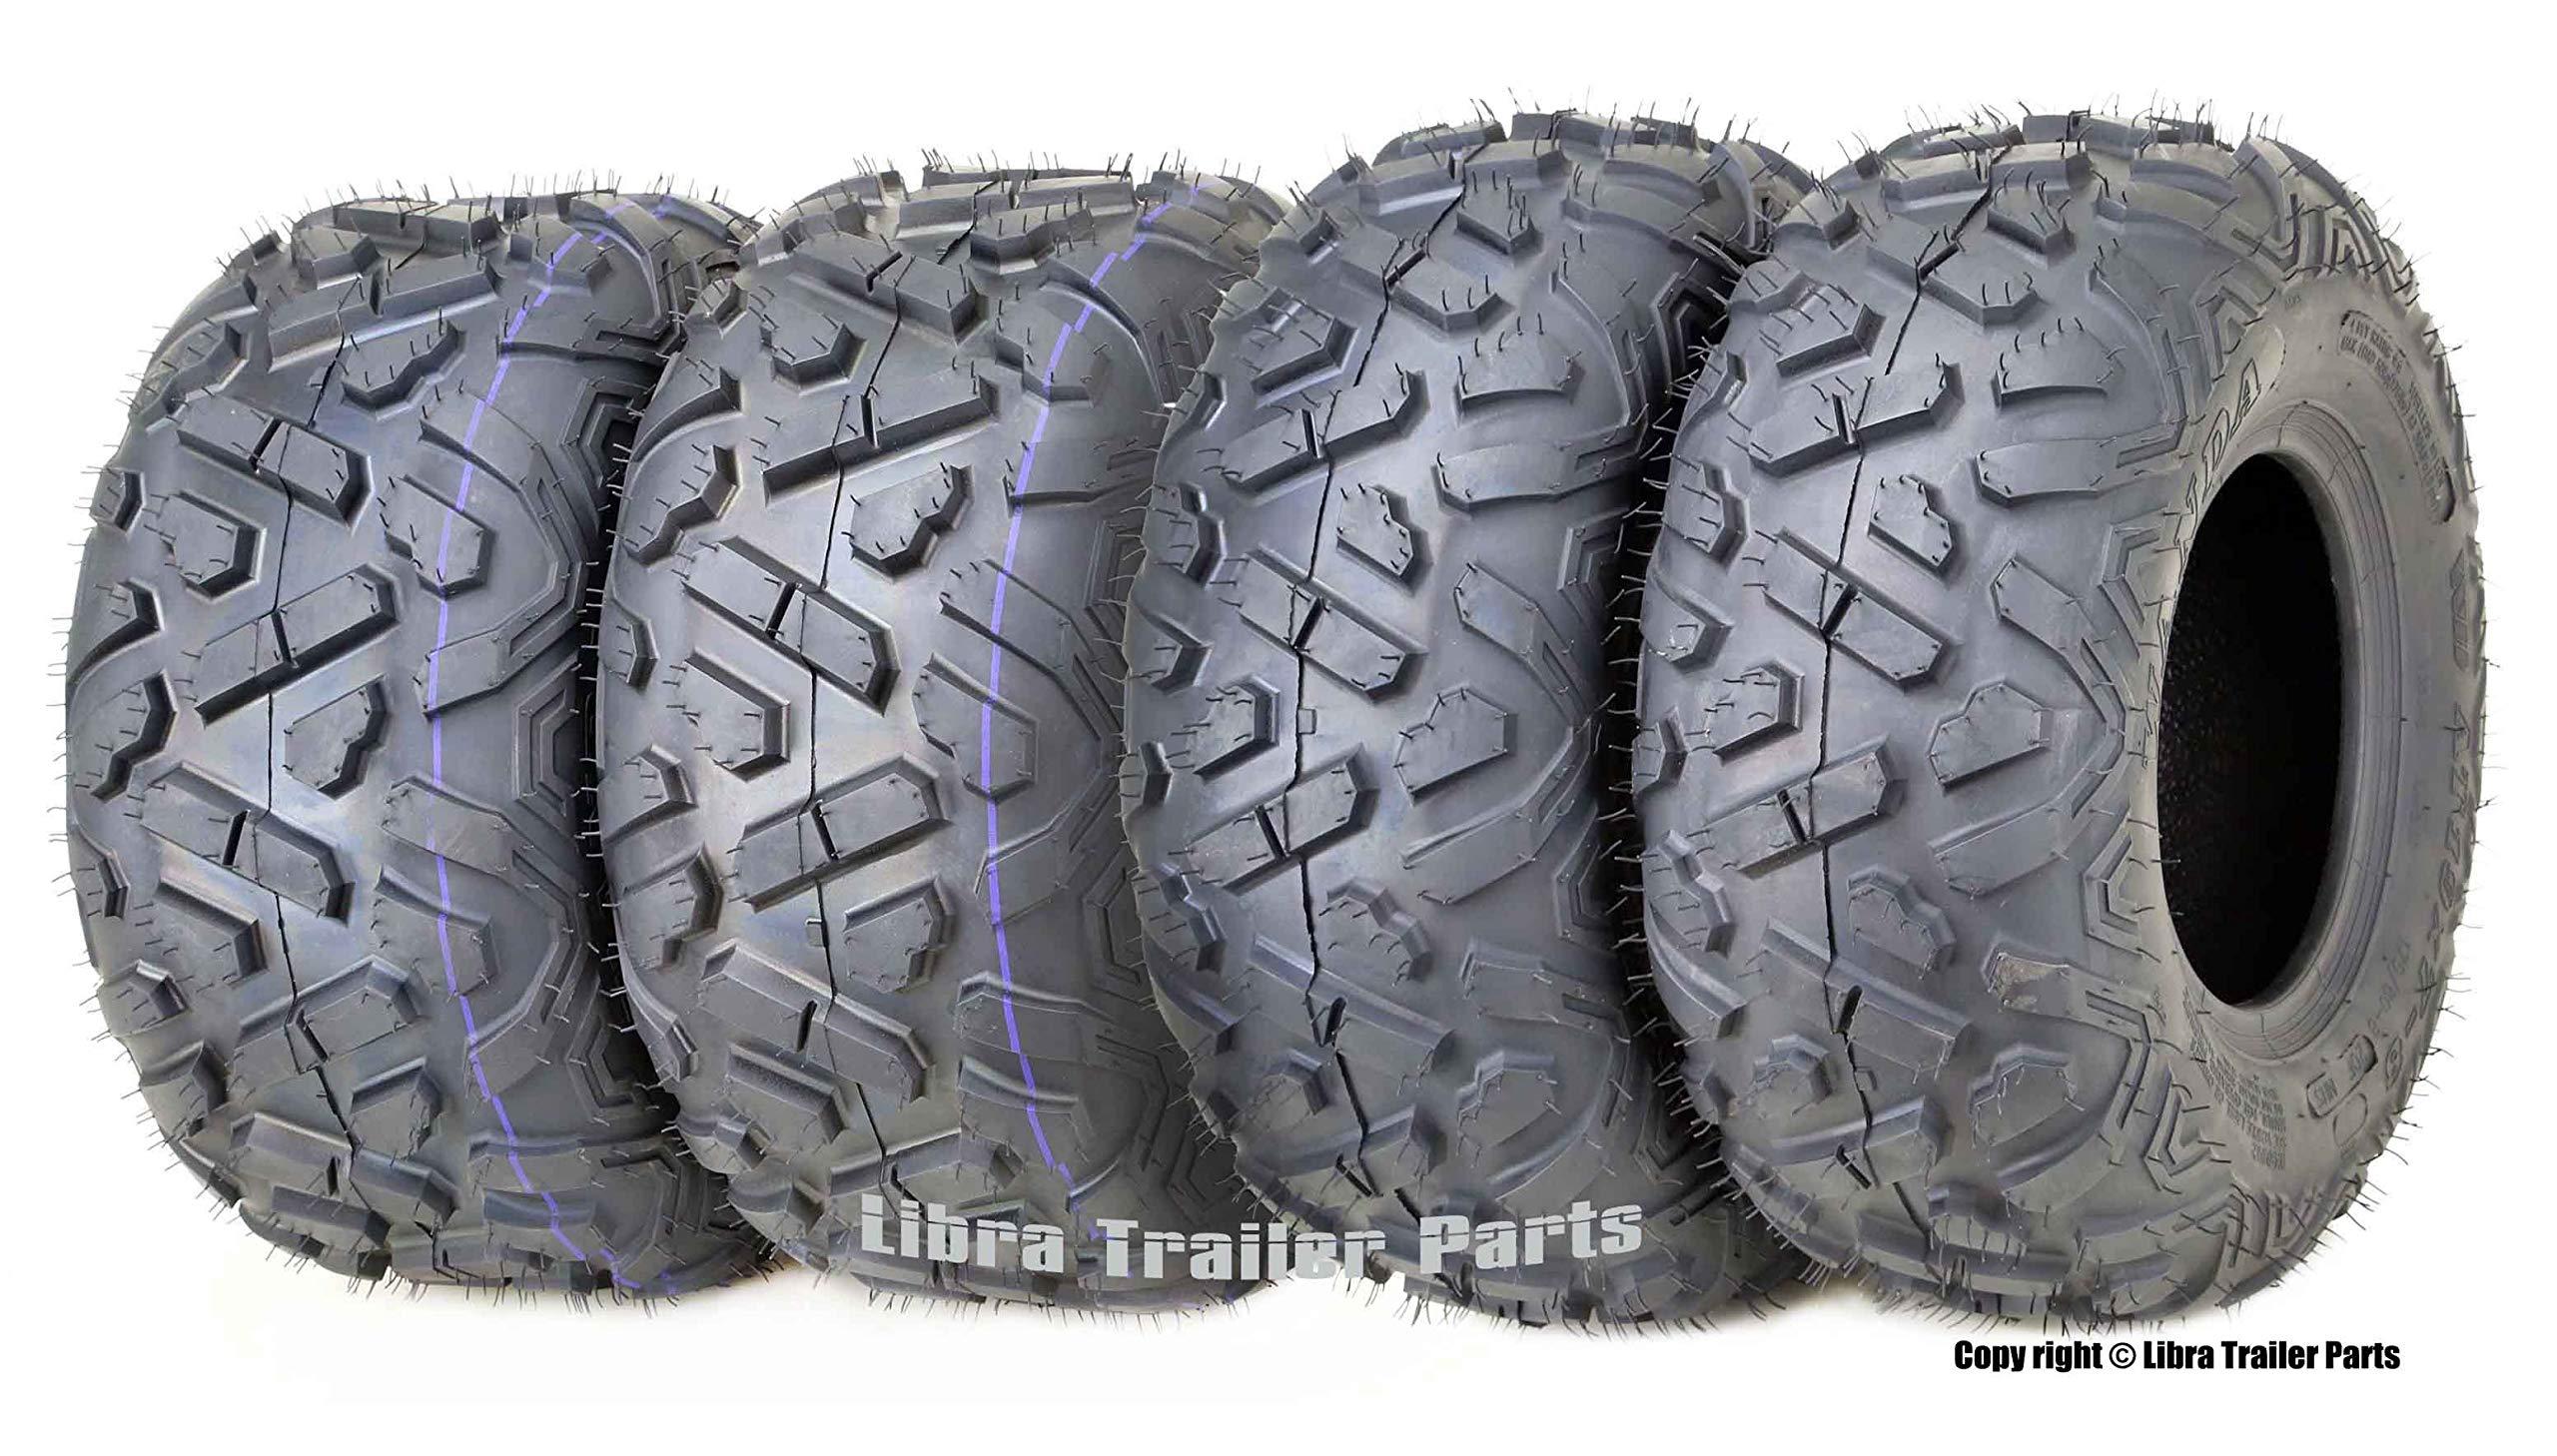 Set of 4 WANDA ATV Tires 19X7-8 Front & 18X9.5-8 4PR Rear Big Horn Style ...